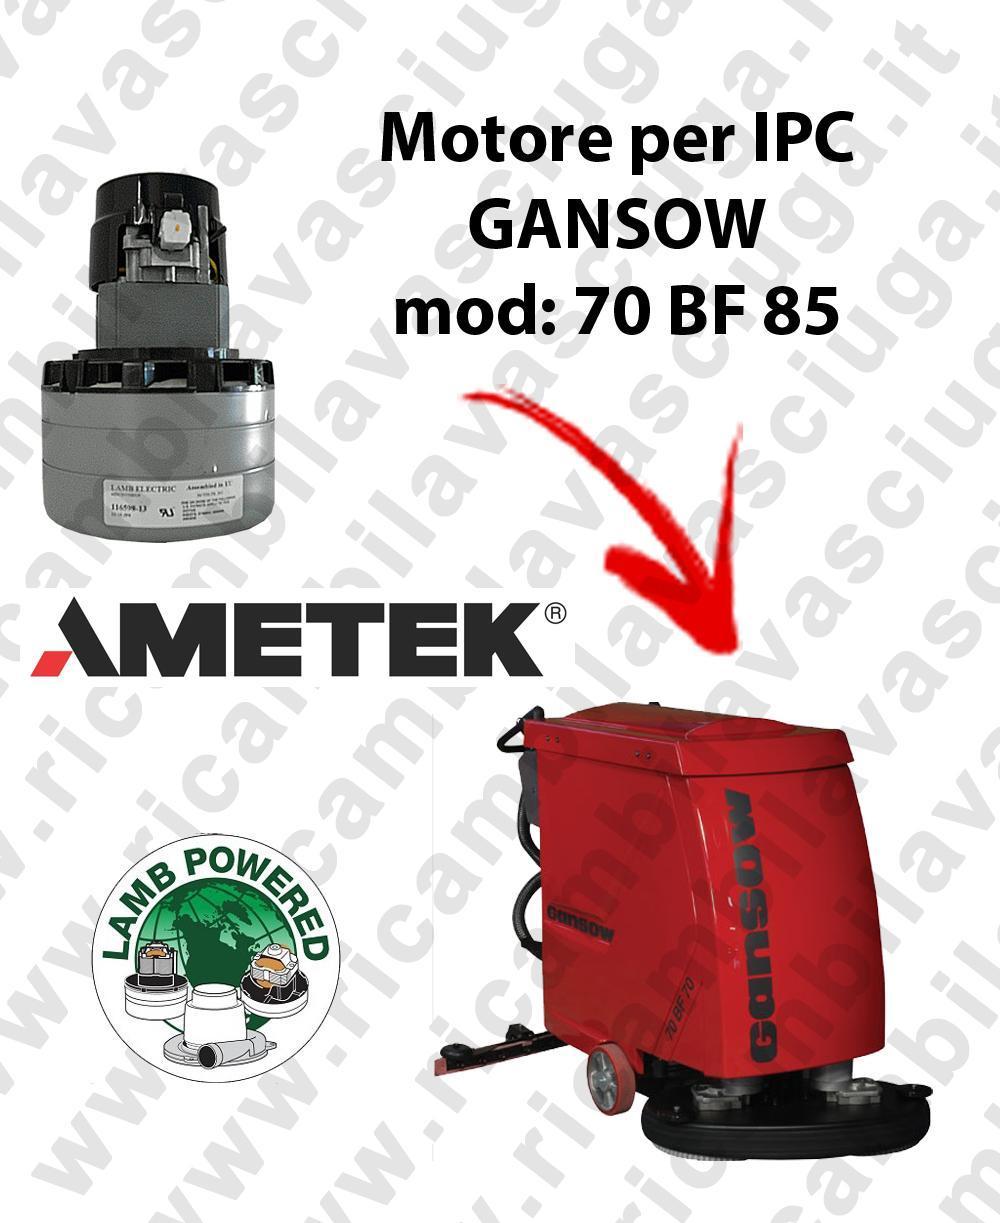 70 BF 85 LAMB AMETEK vacuum motor for scrubber dryer IPC GANSOW